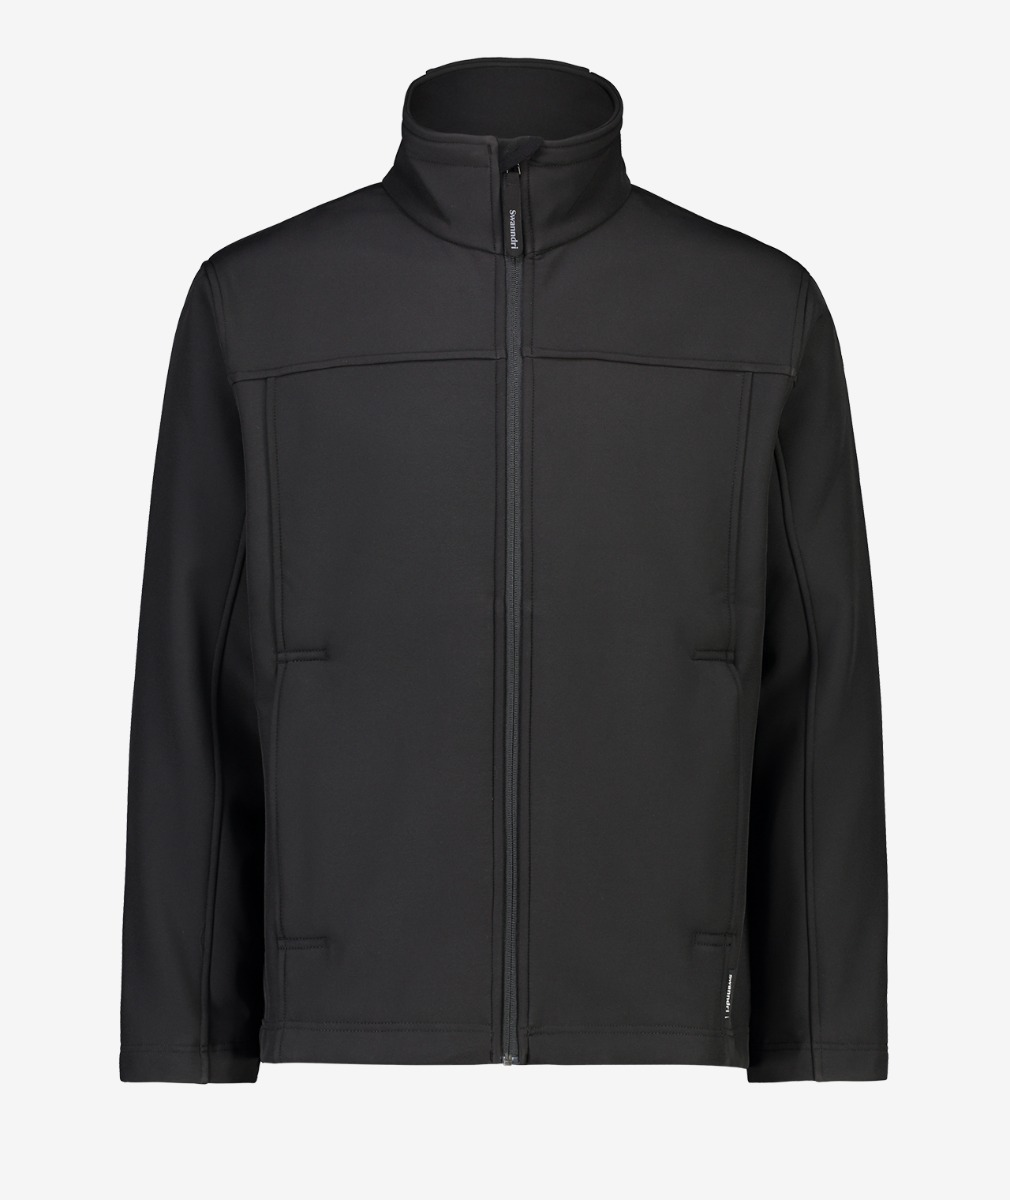 Swanndri Men's Benson Softshell Jacket in Black